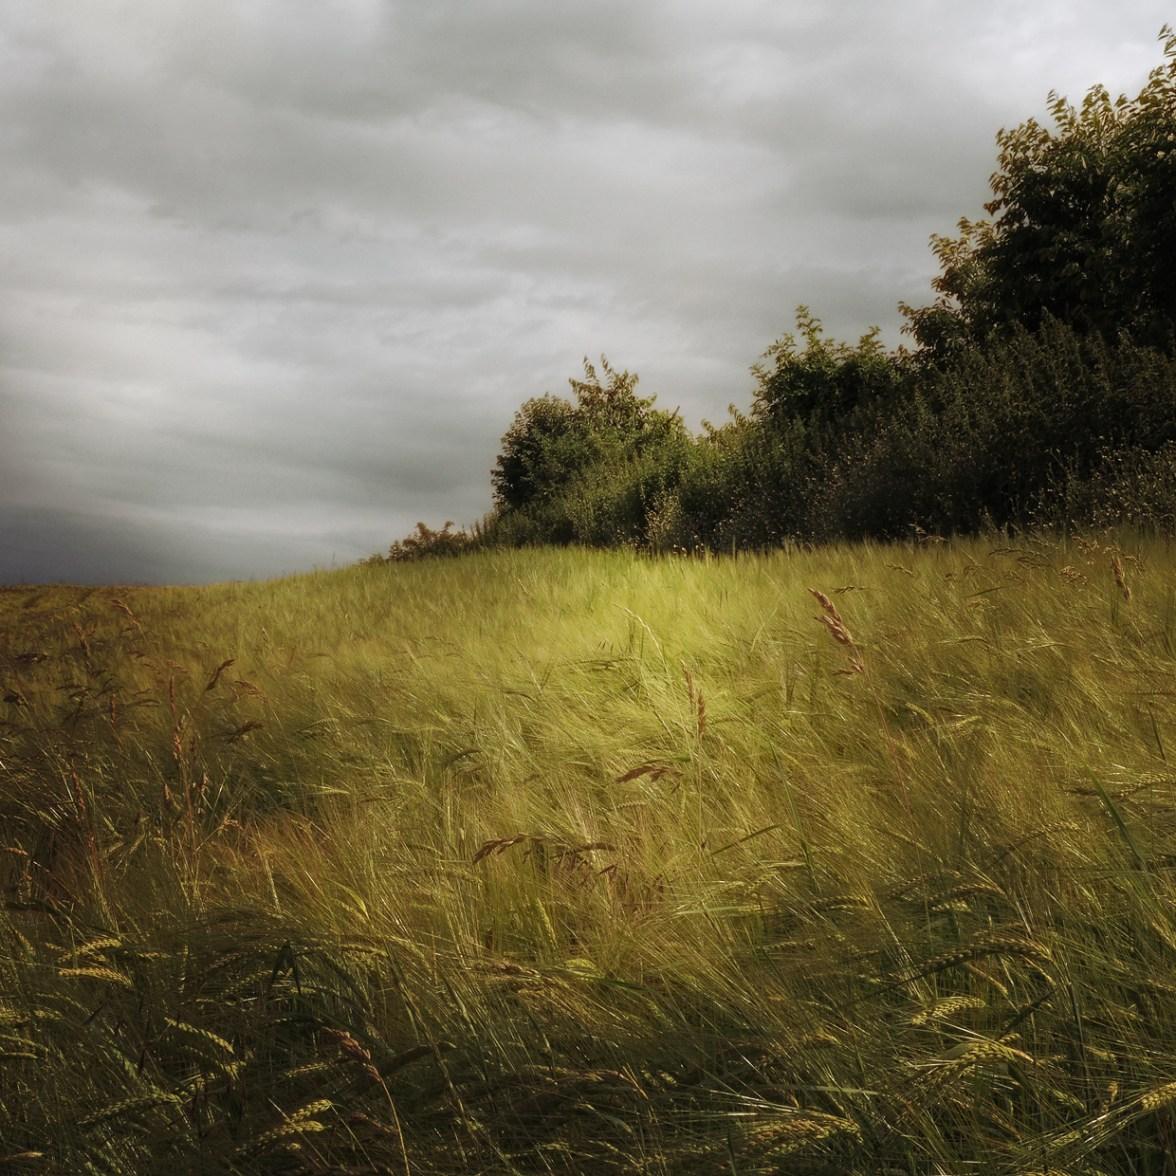 Field Study © Bernd Webler